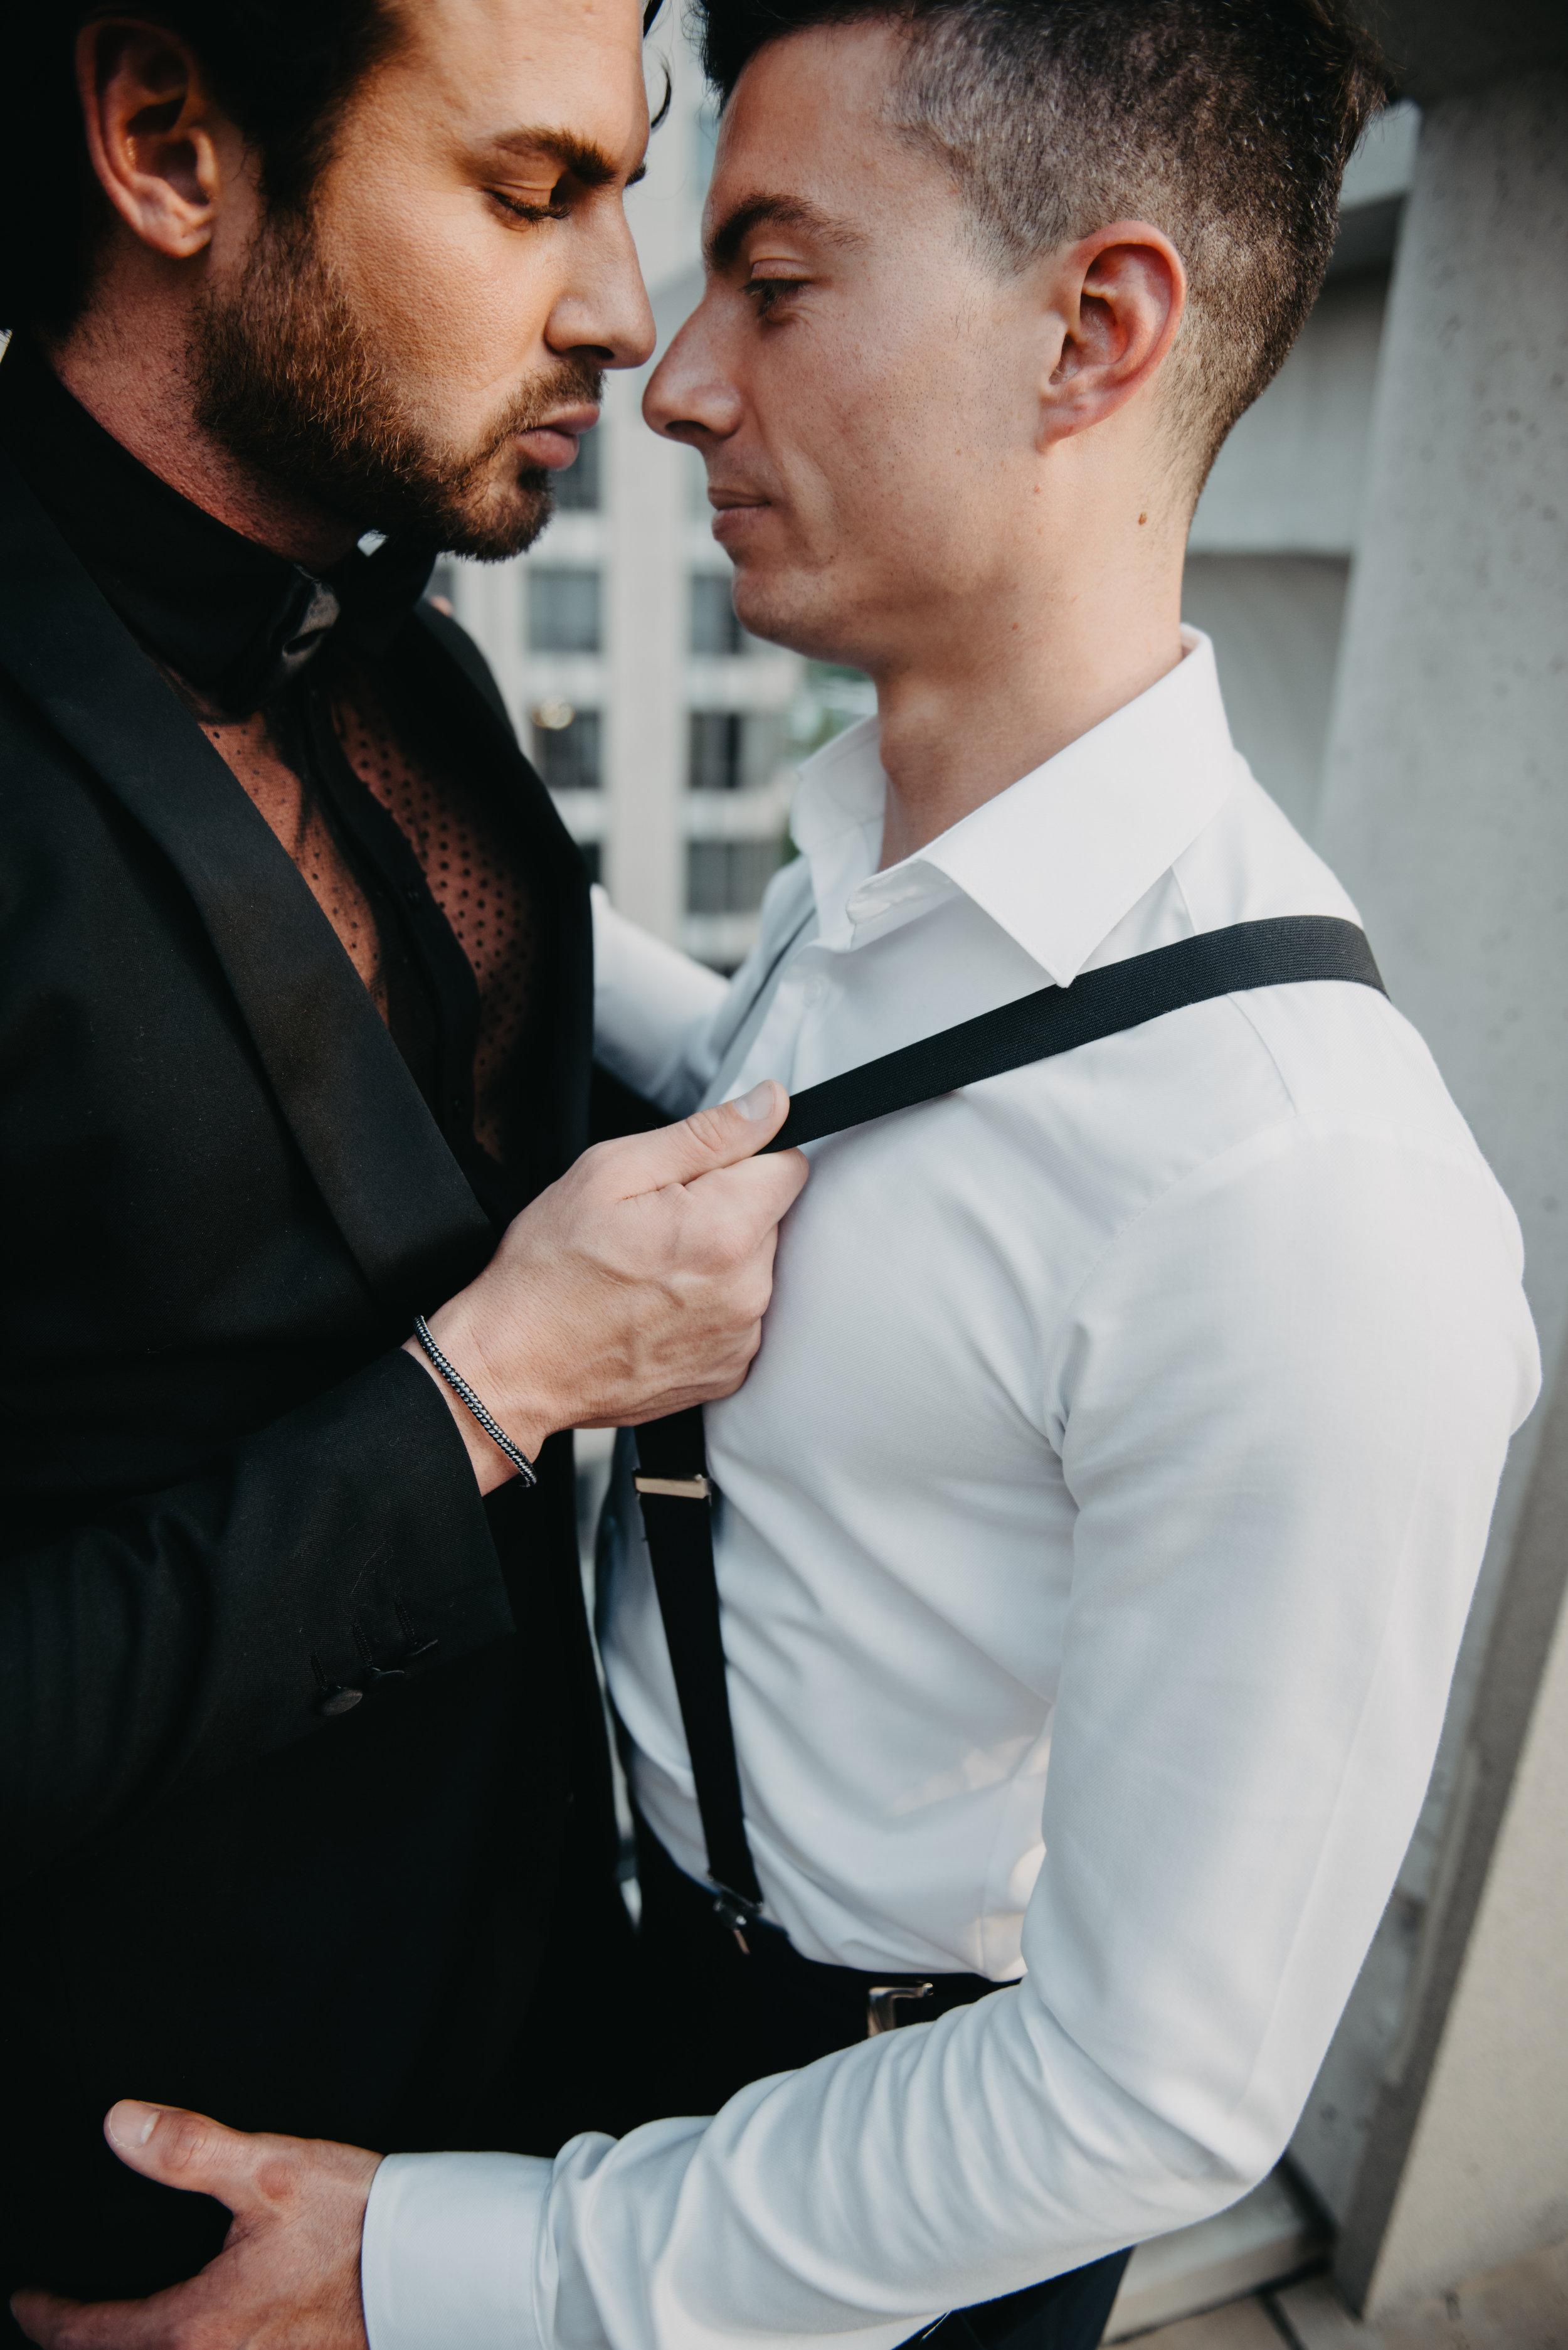 Gay_Toronto_Photoshoot-83561.jpg